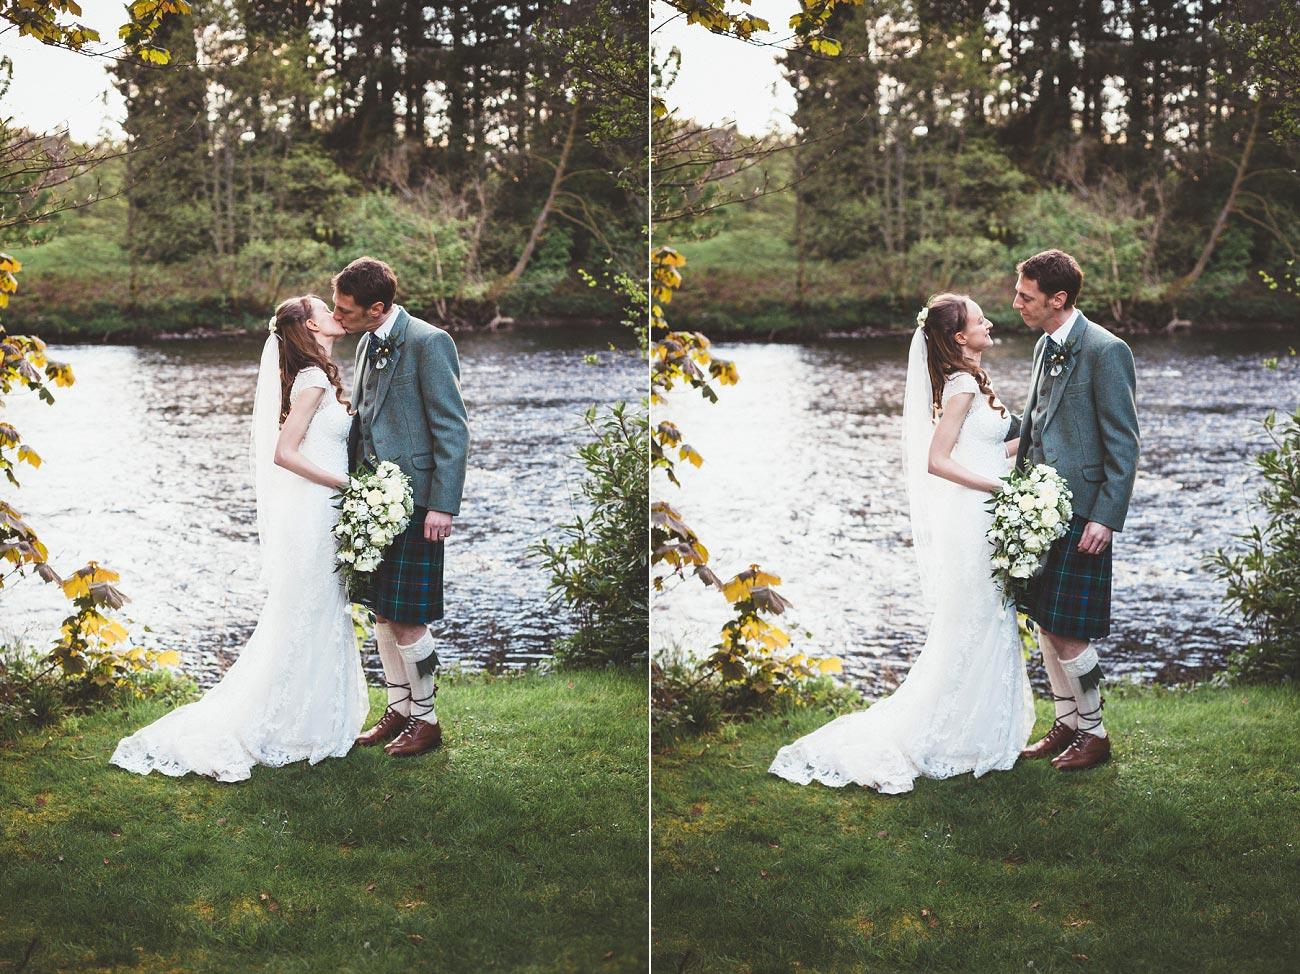 wedding photographer trossach kirk church roman camp hotel callander scotland 0104